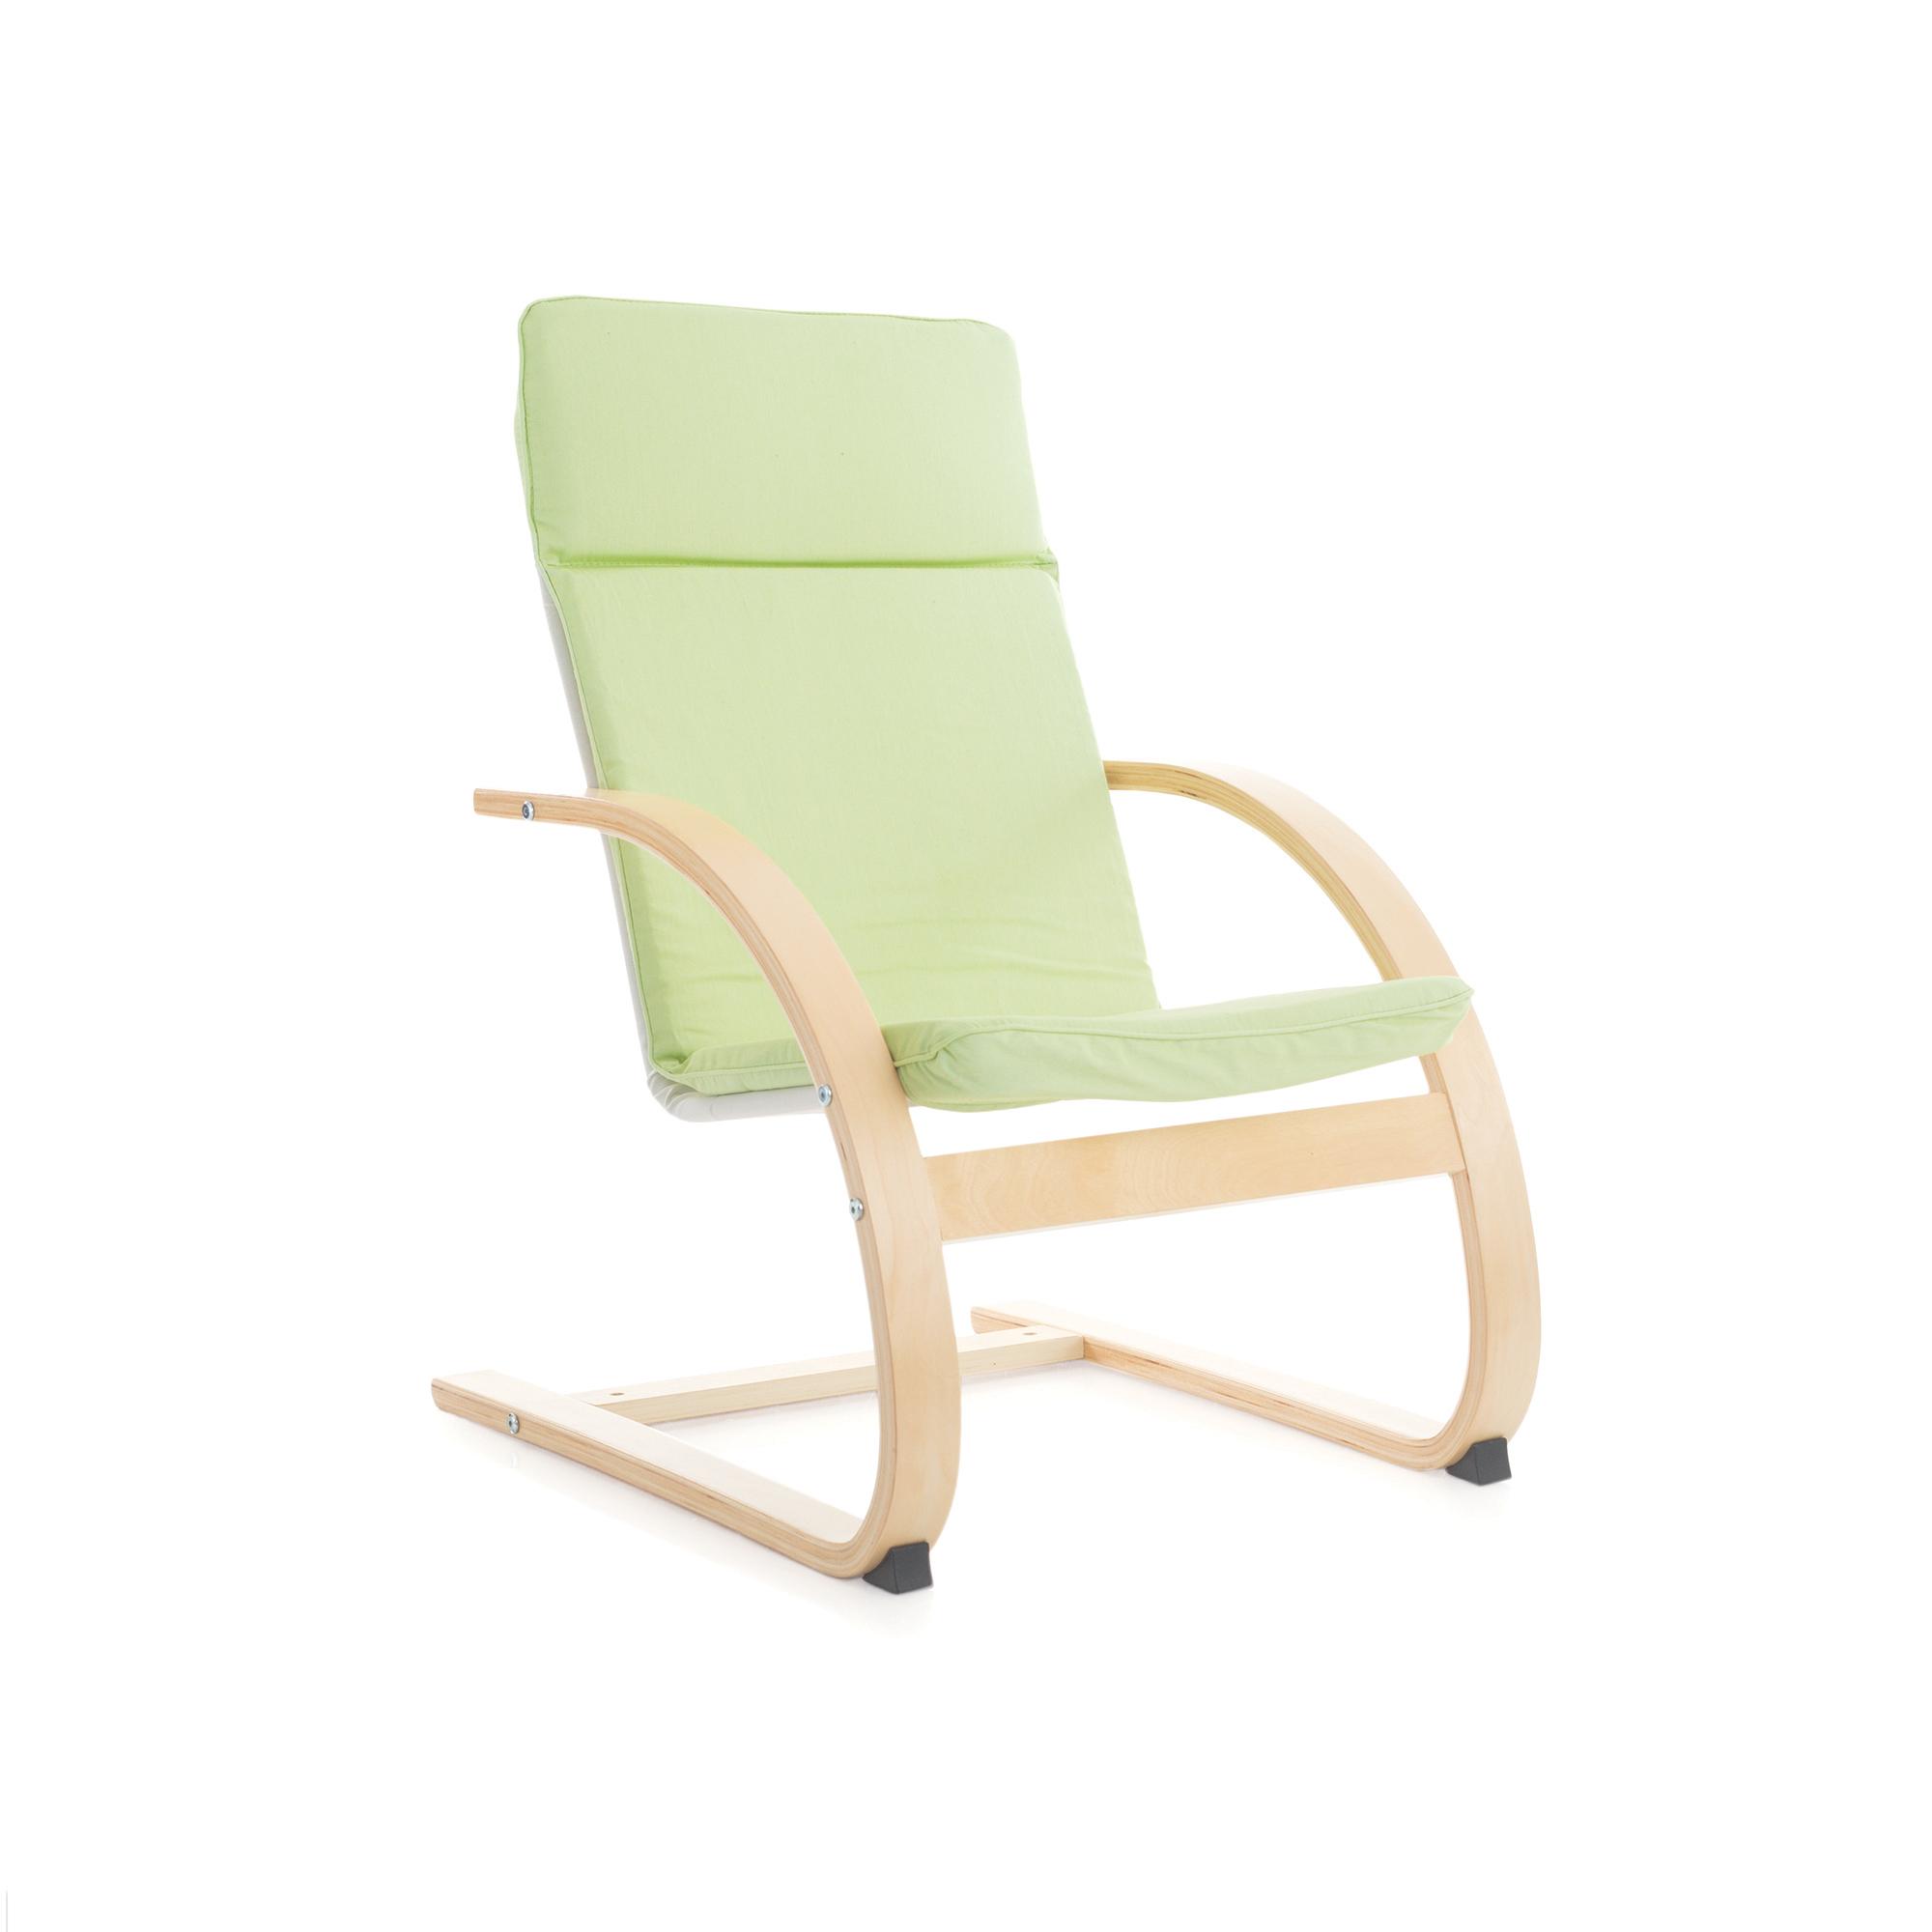 chair covers sage green steel manufacturers in delhi guidecraft nordic rocker